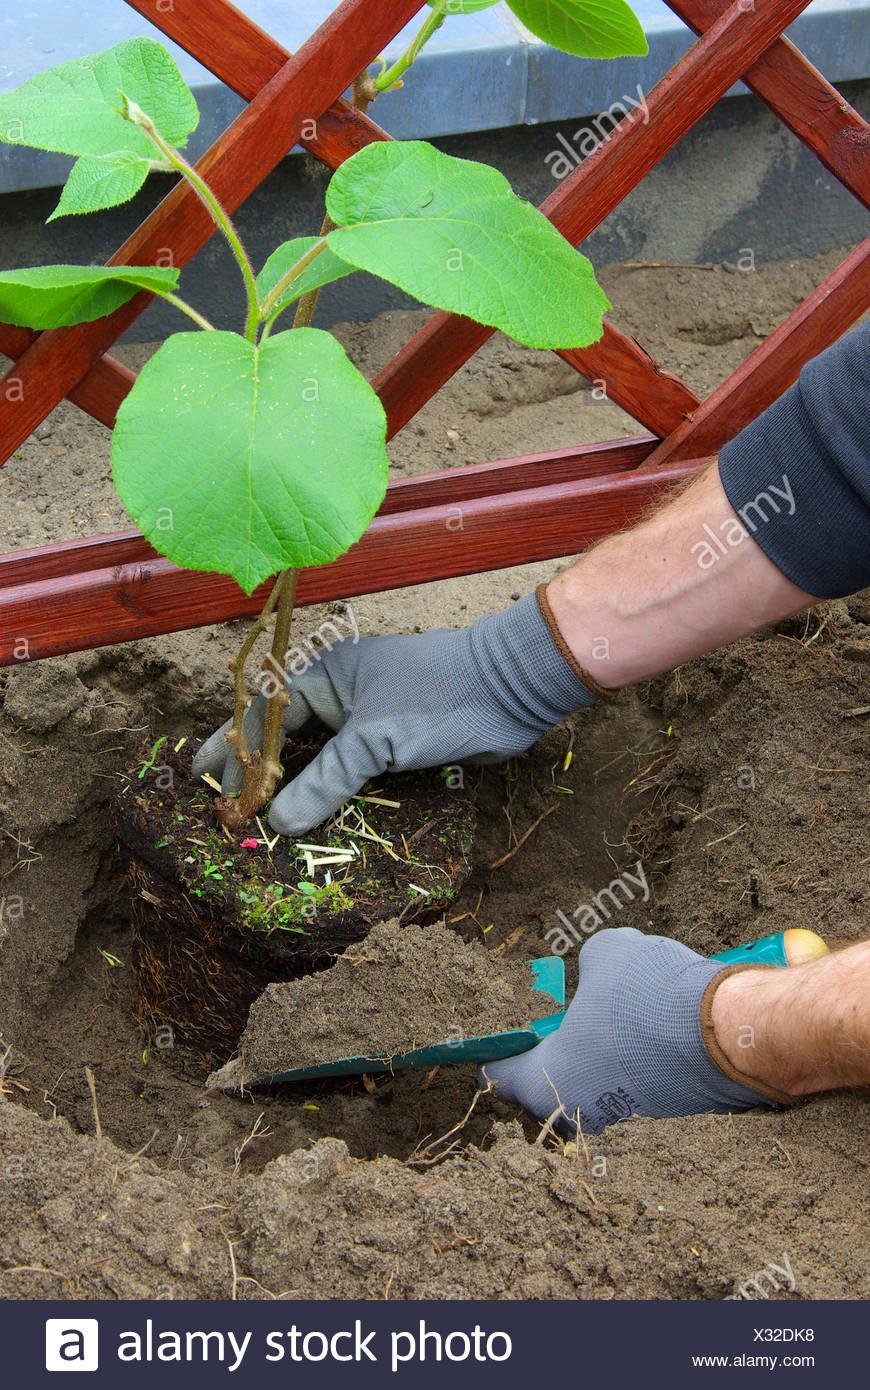 kiwipflanze plants - planting a kiwi plant 03 - Stock Image